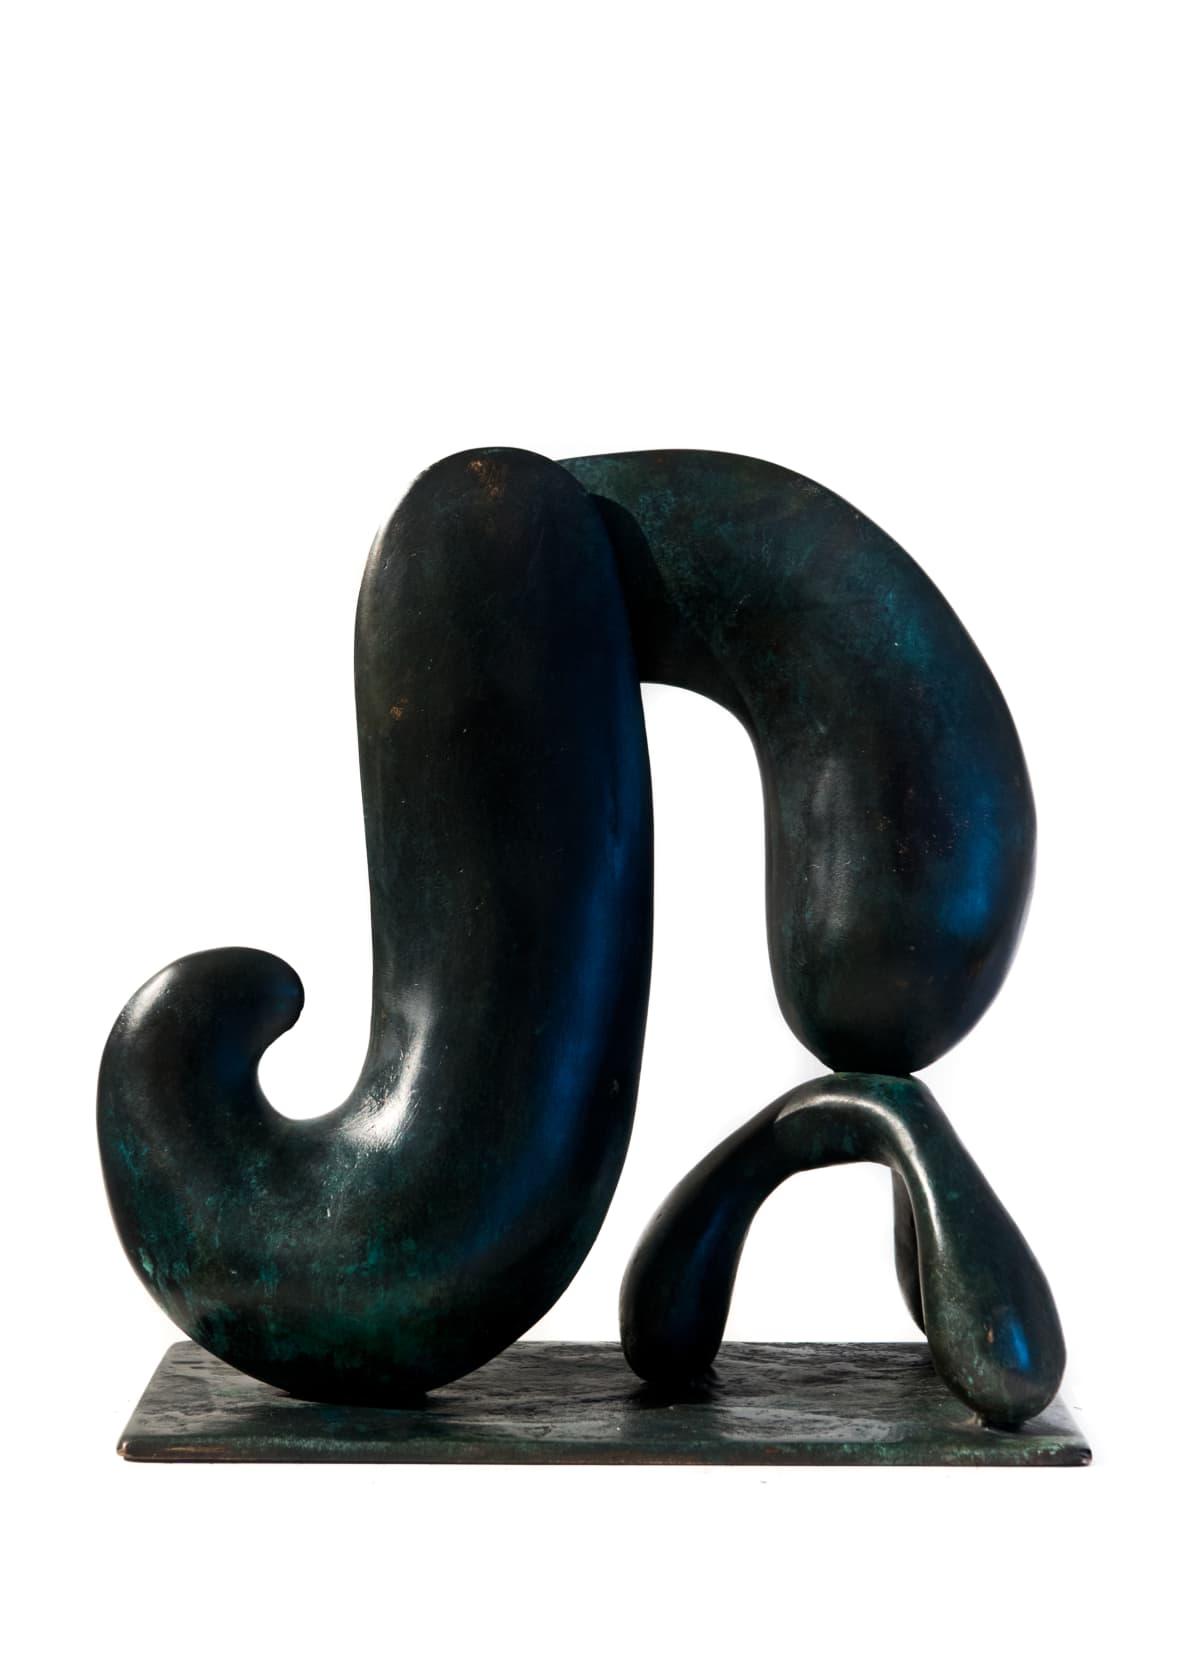 Paul DIBBLE Bathers Study 1, 2013 Cast Patinated Bronze 14.6 x 13.4 x 6.3 in 37 x 34 x 16 cm #1/2